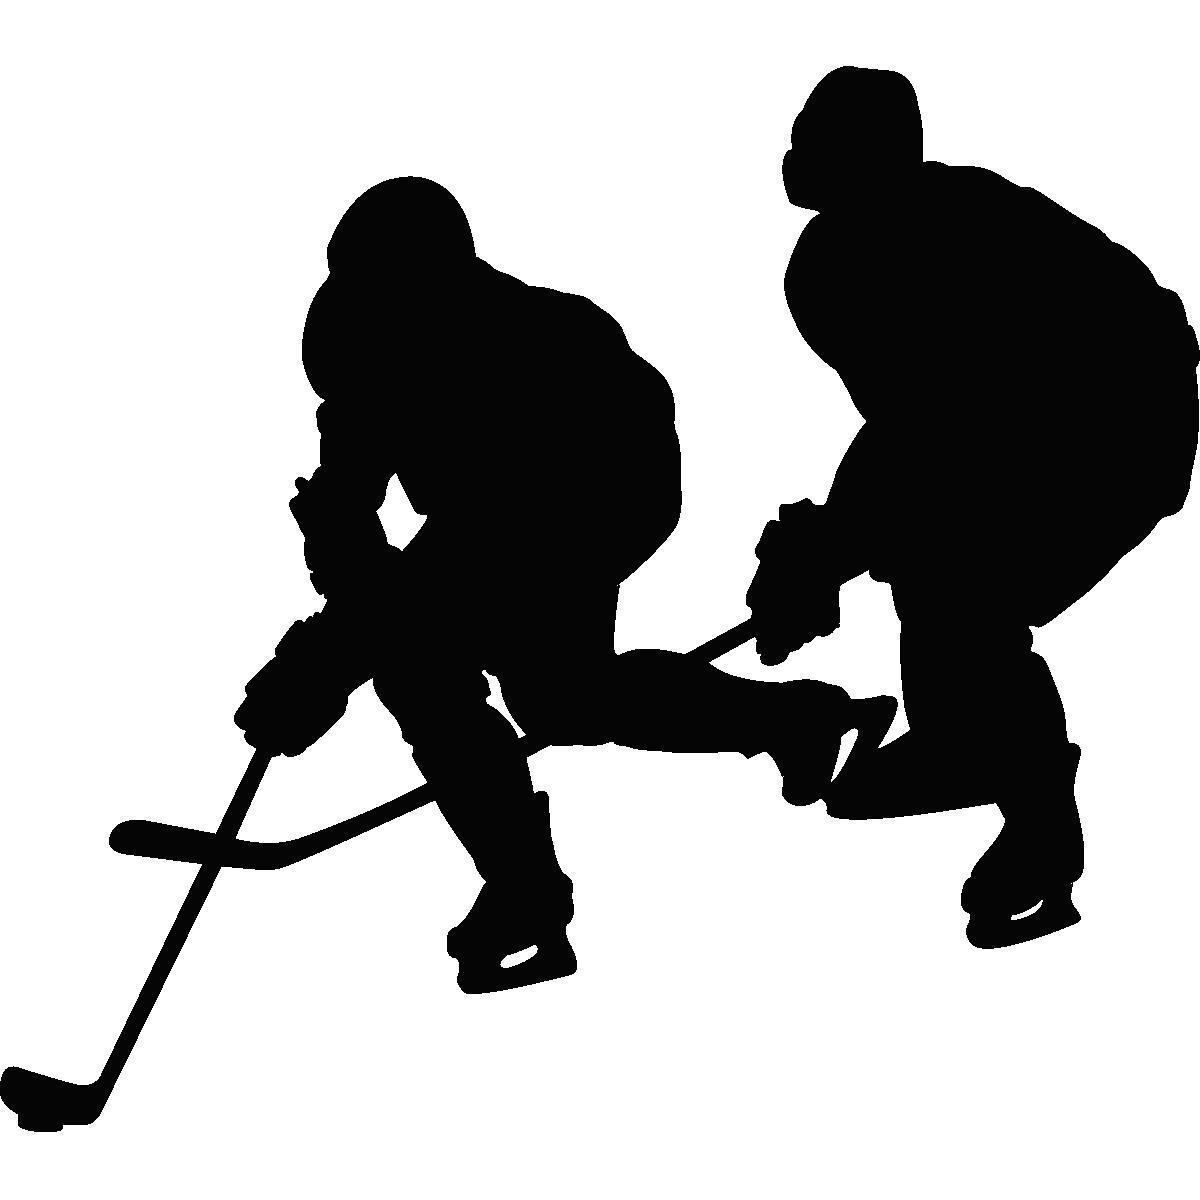 Muursticker ijshockey spelers muurstickers muziek cinema silhouetten ambiance sticker - Deco kamer stijl engels ...